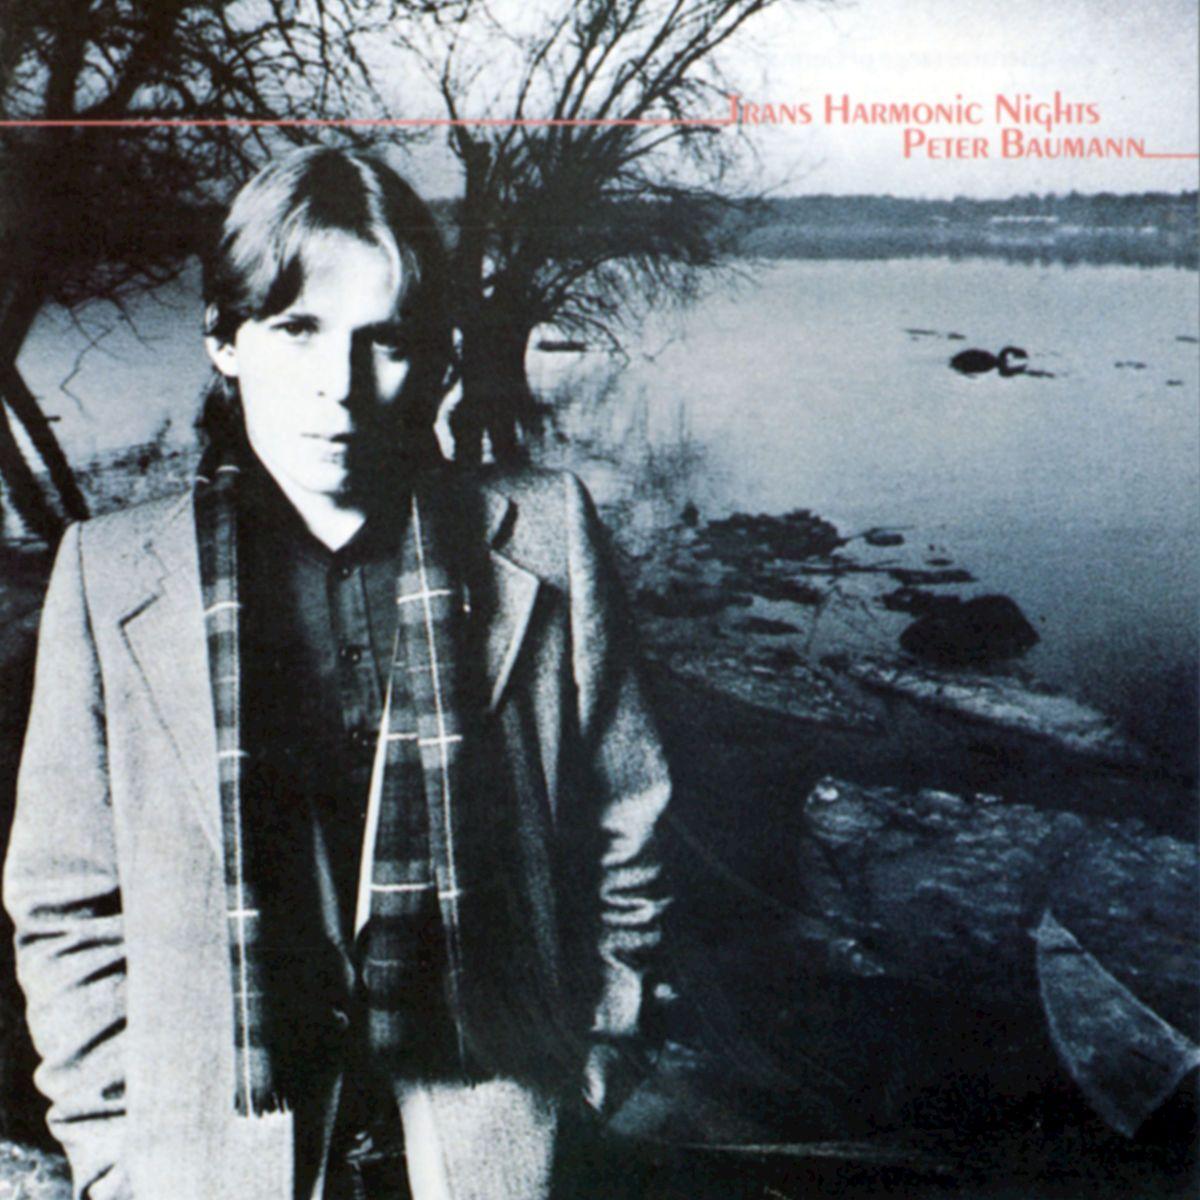 Peter Baumann. Trans Harmonic Nights: Remastered Edition peter baumann projecting the future